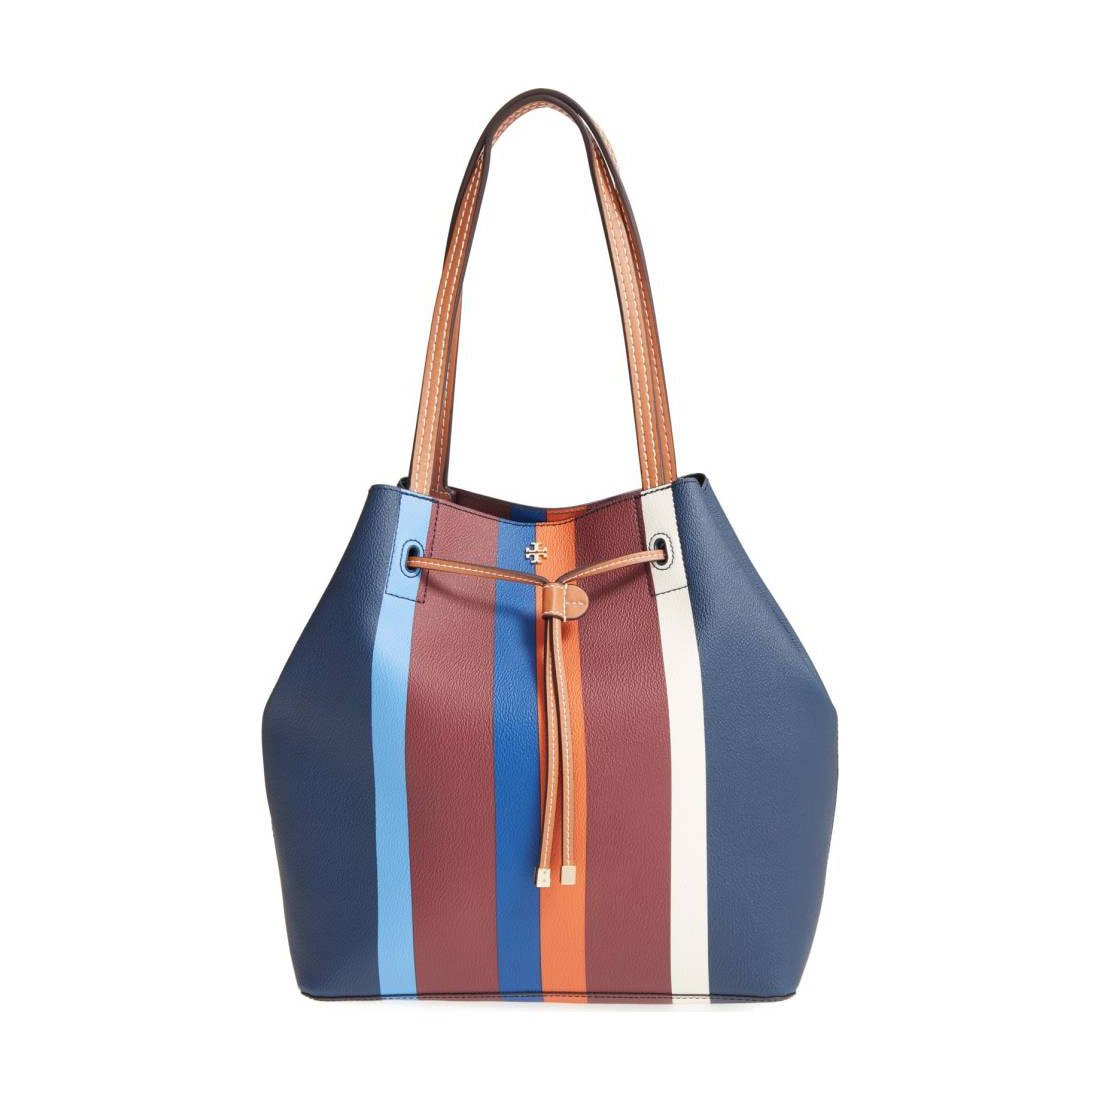 7f6ae7bbed0 Tory Burch Large Kerrington Stripe Bucket Bag  Amazon.ca  Shoes   Handbags